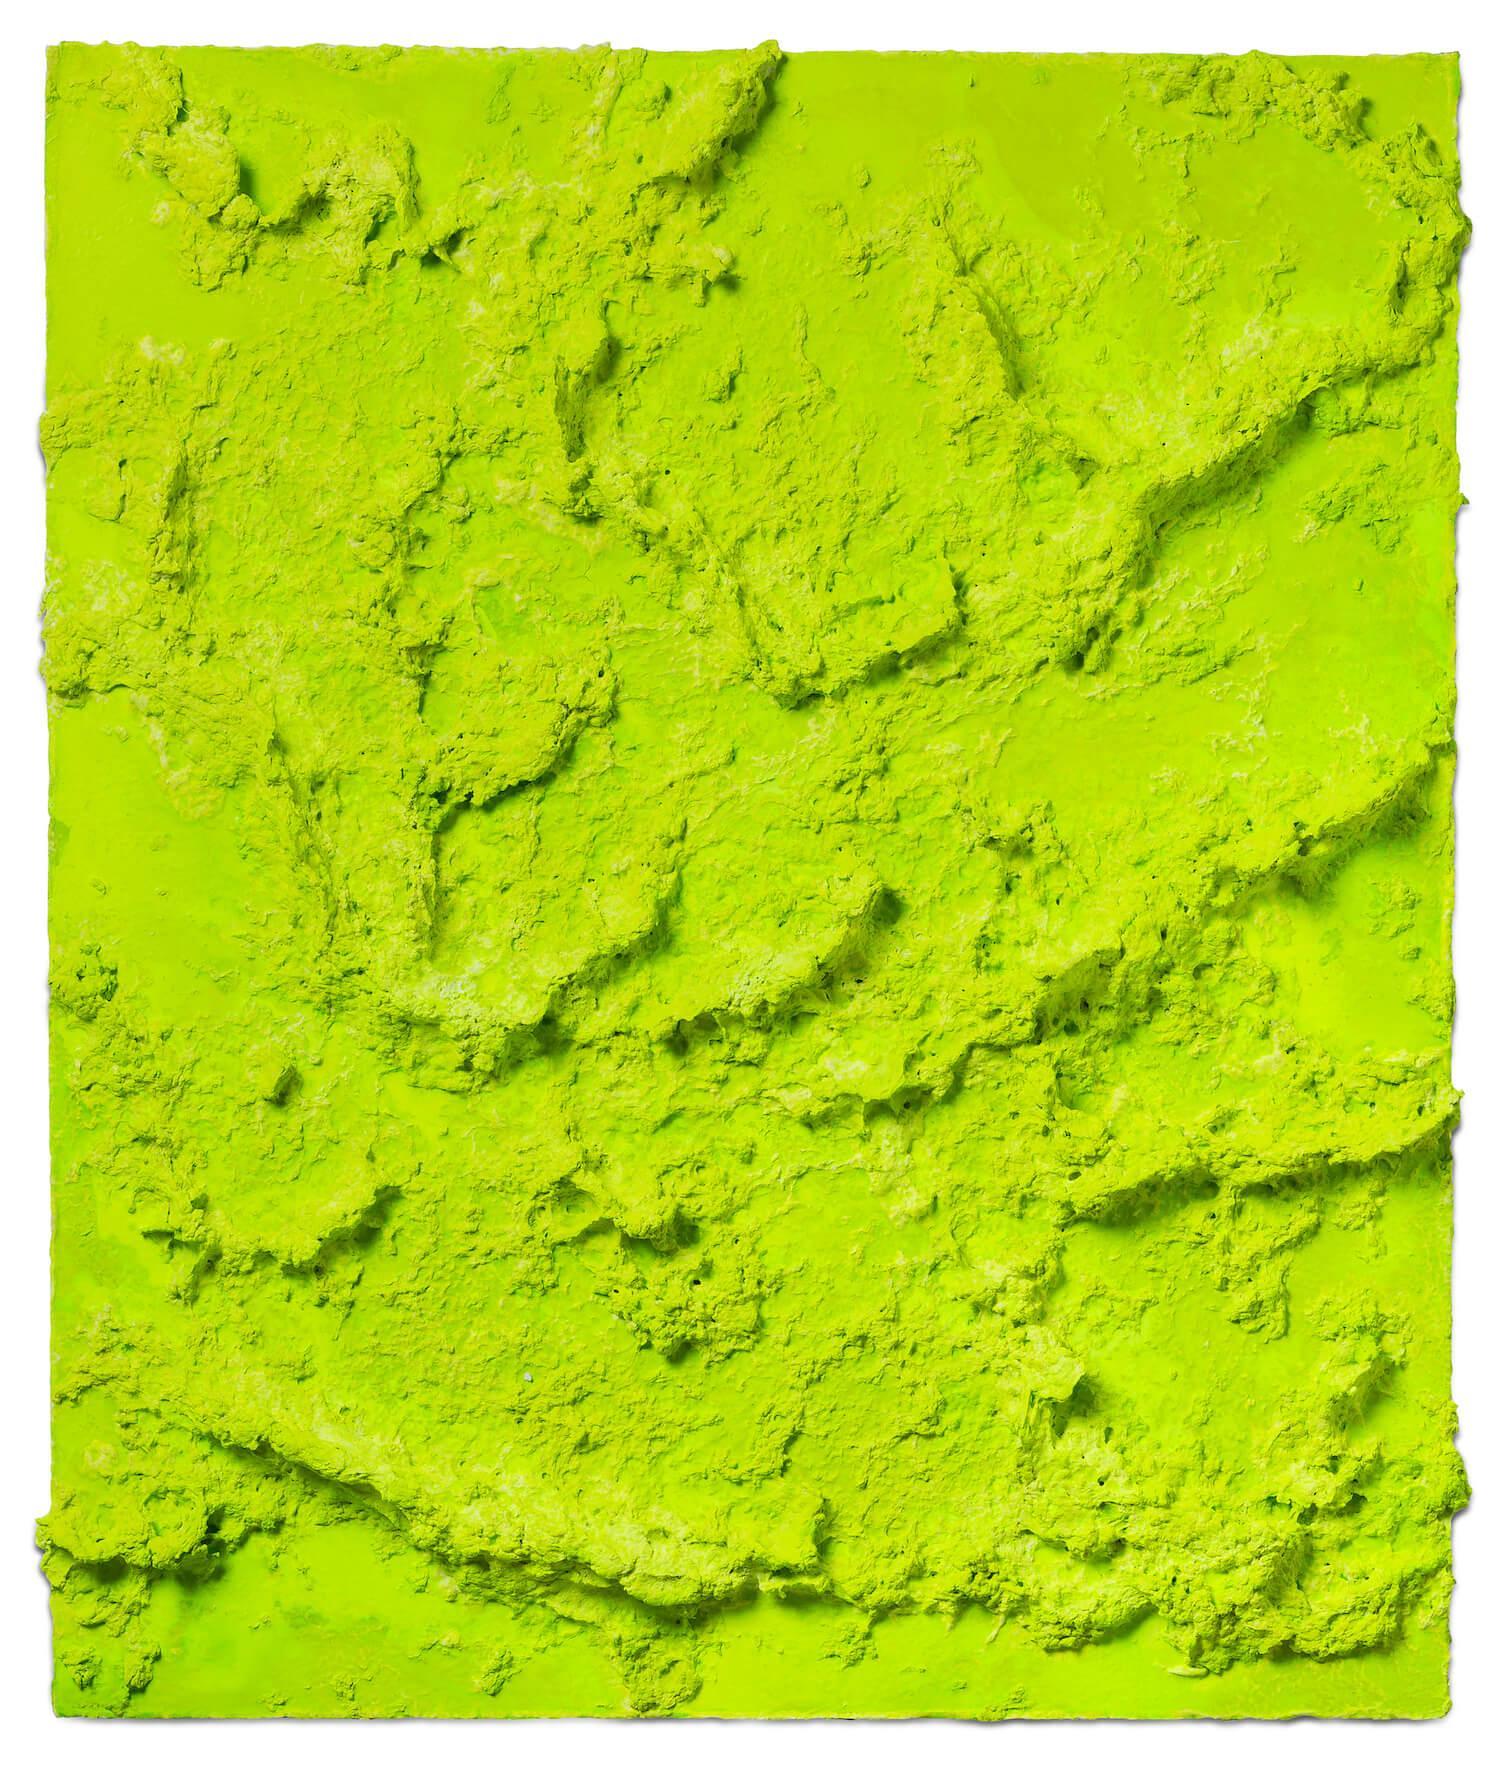 Jason Martin, 'Selvagem I', 2018, pulp and cel-vinyl on paper, 88 x 75 x 6cm. Image courtesy of STPI Gallery.